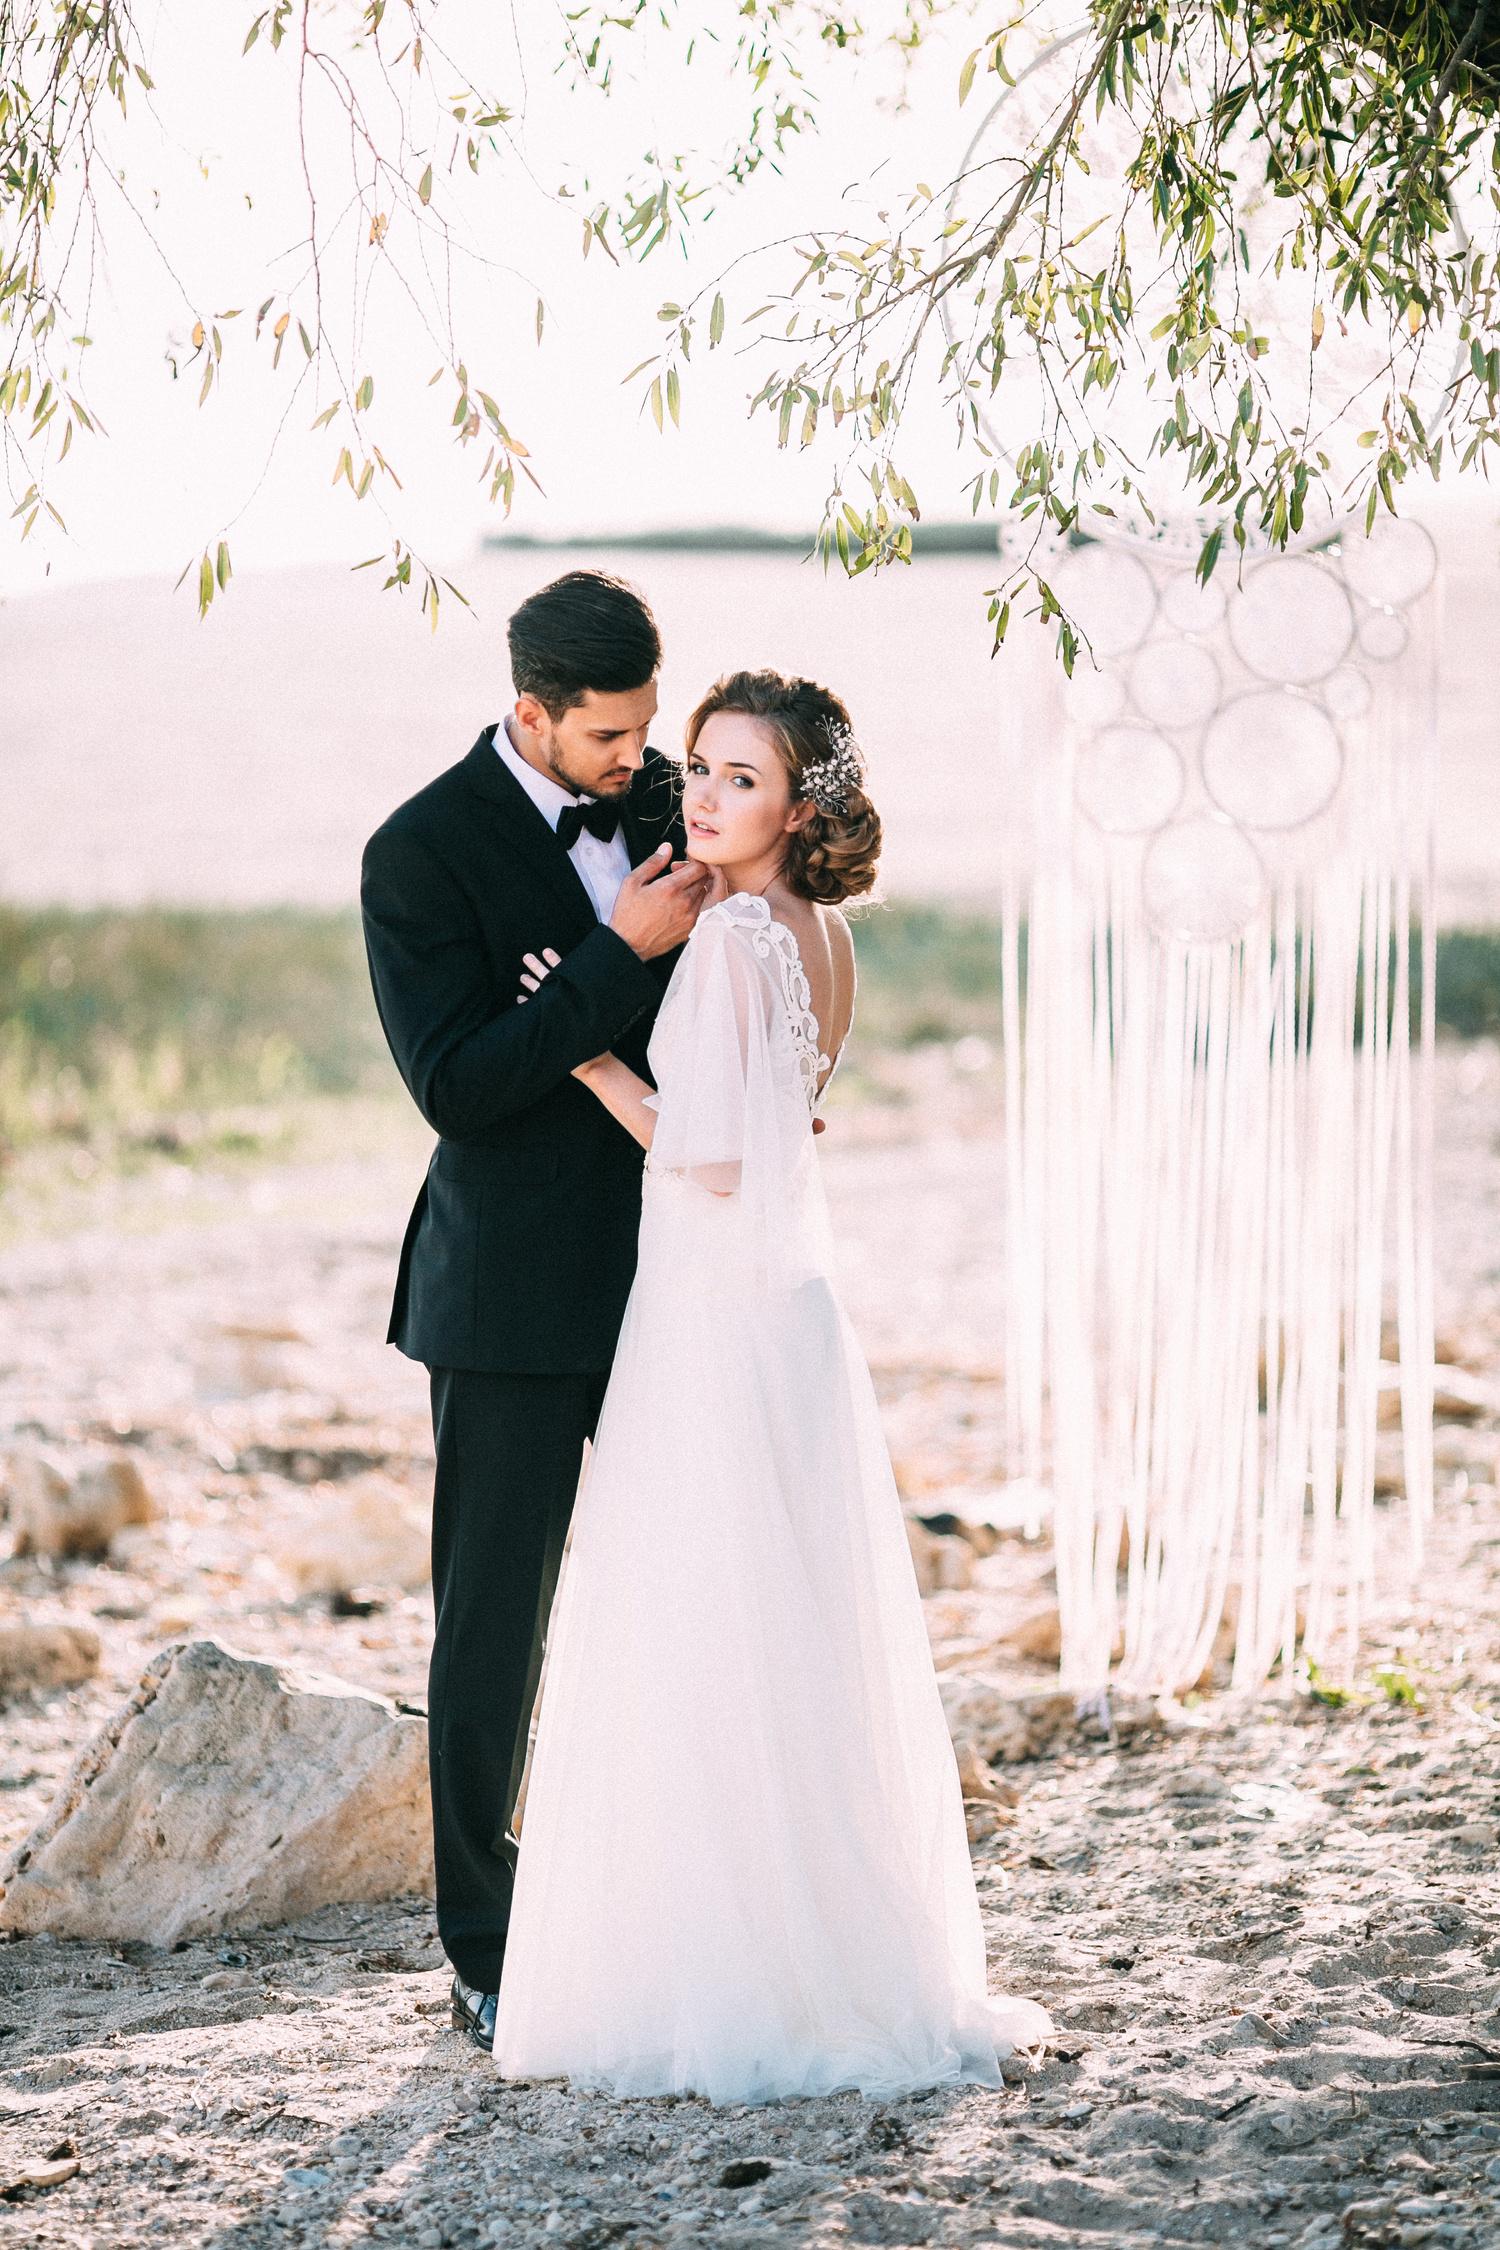 Wedding Photo Musts: Dreamy Beach Wedding: Styled Photo Shoot In Tender